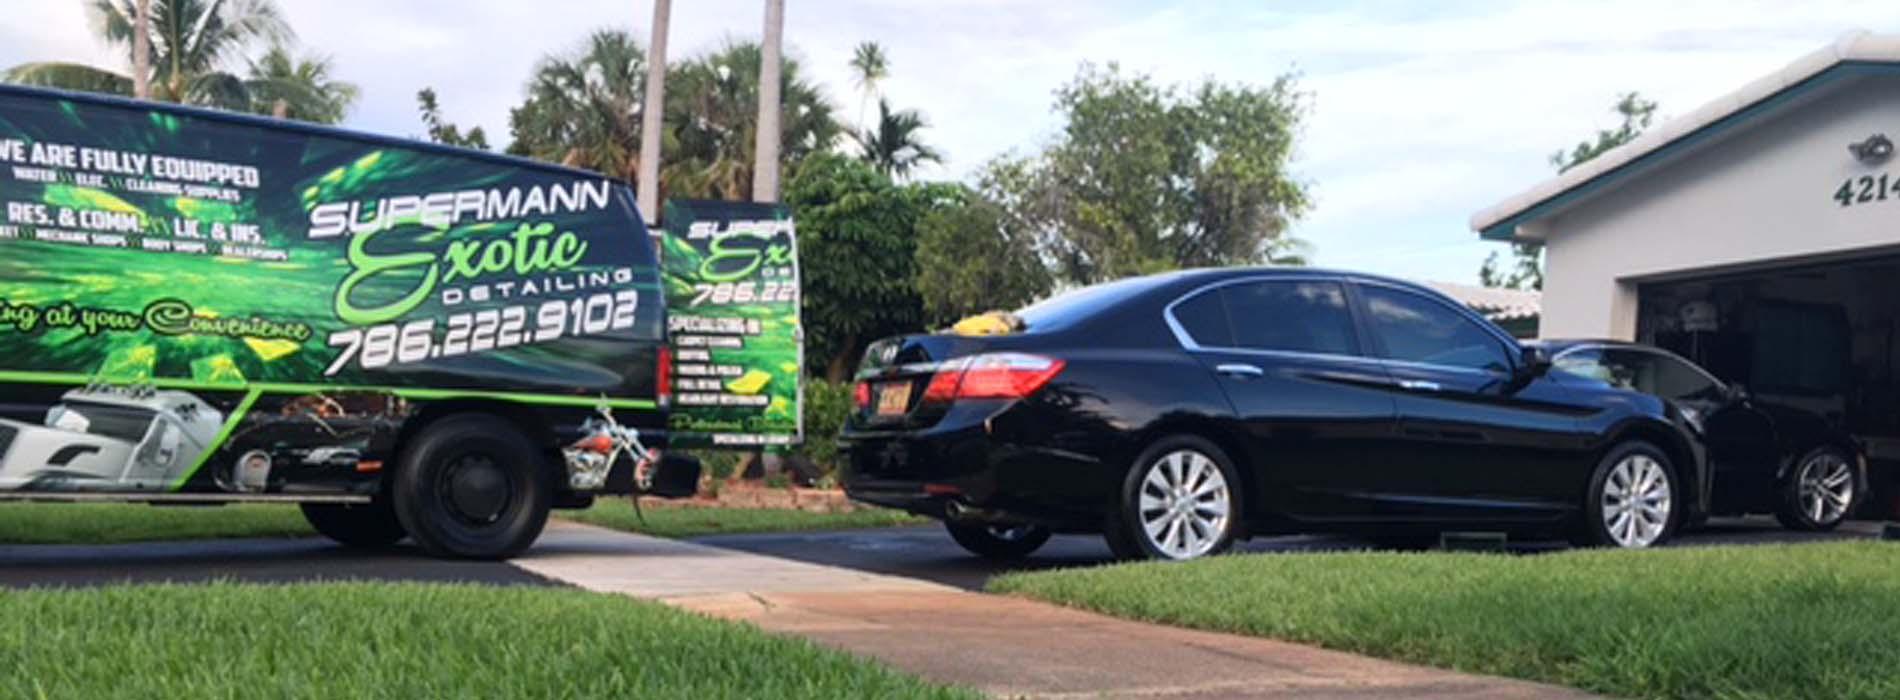 Car Wash Boca Raton >> Home Weston Car Wash Auto Detailing And Mobile Car Wash